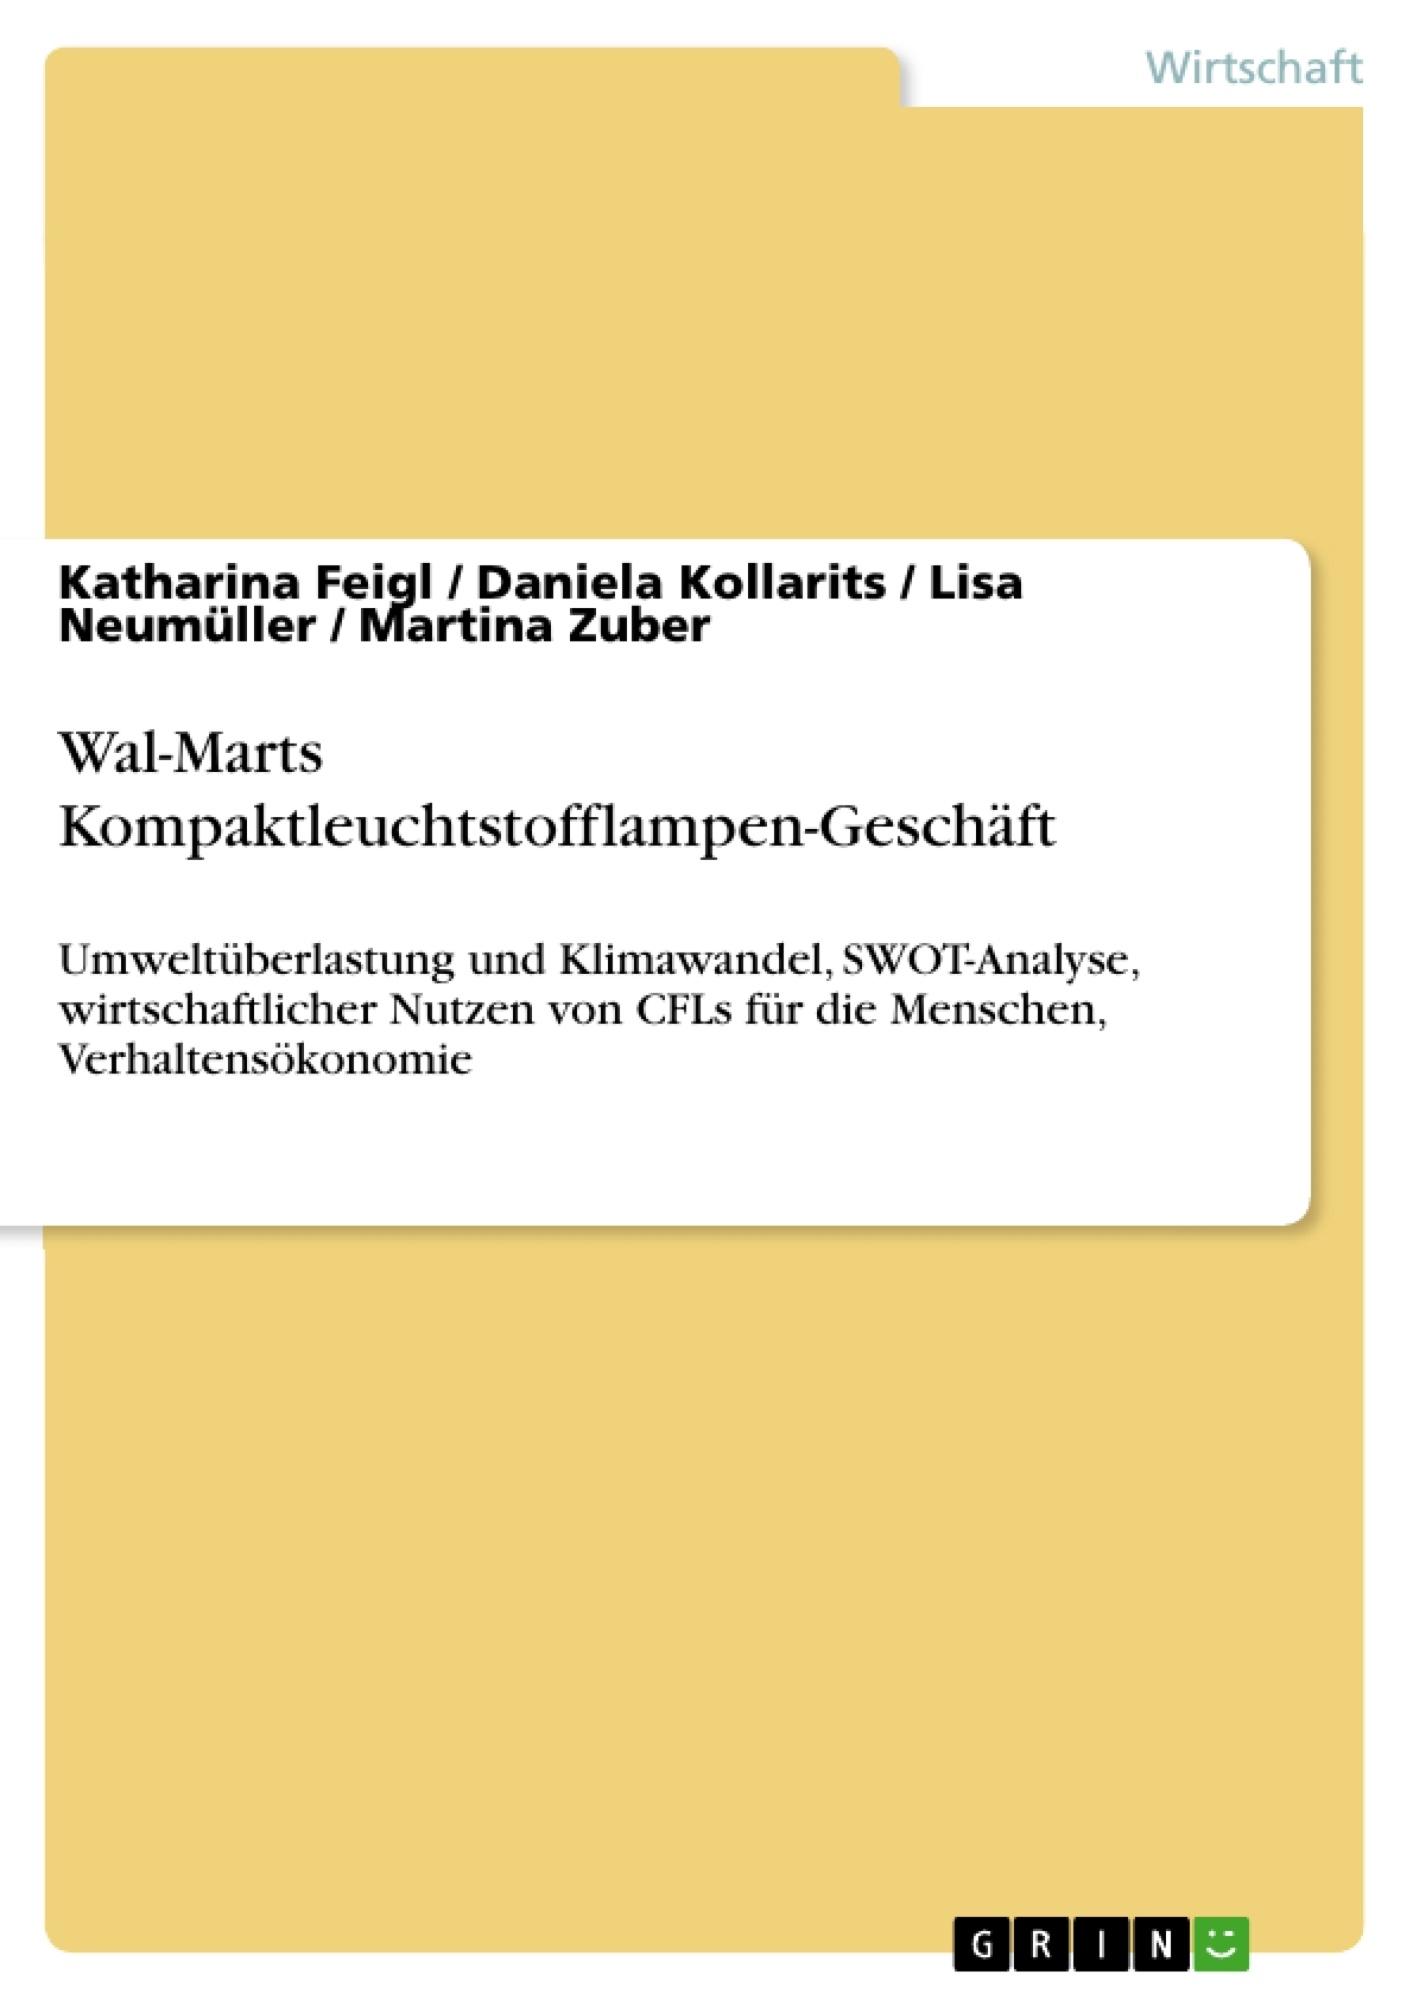 Titel: Wal-Marts Kompaktleuchtstofflampen-Geschäft